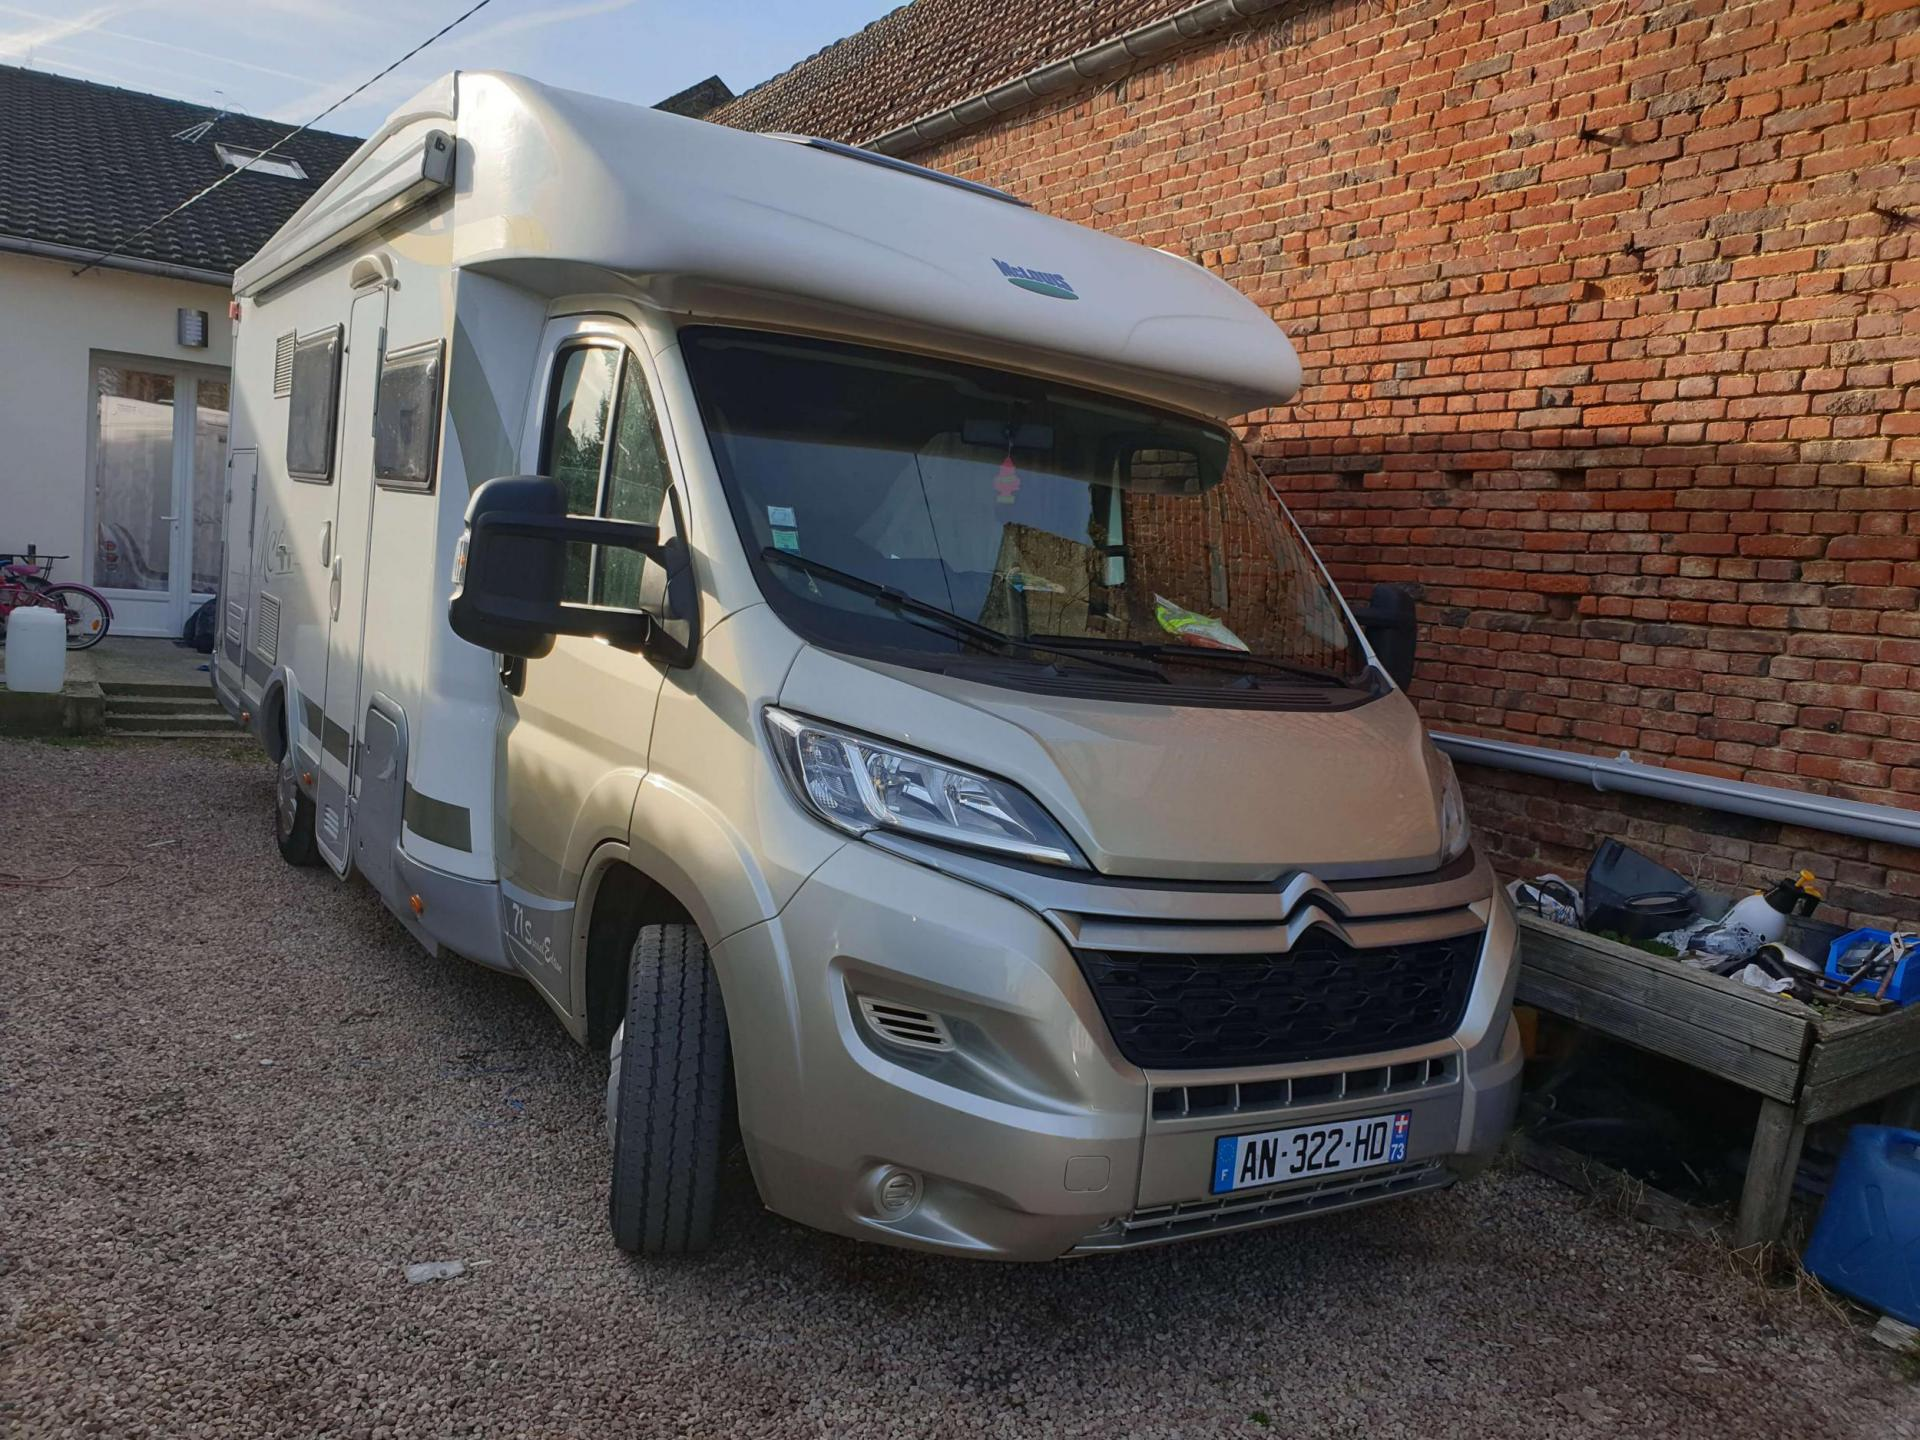 camping-car MC LOUIS MC4 71 Spéciale Edition